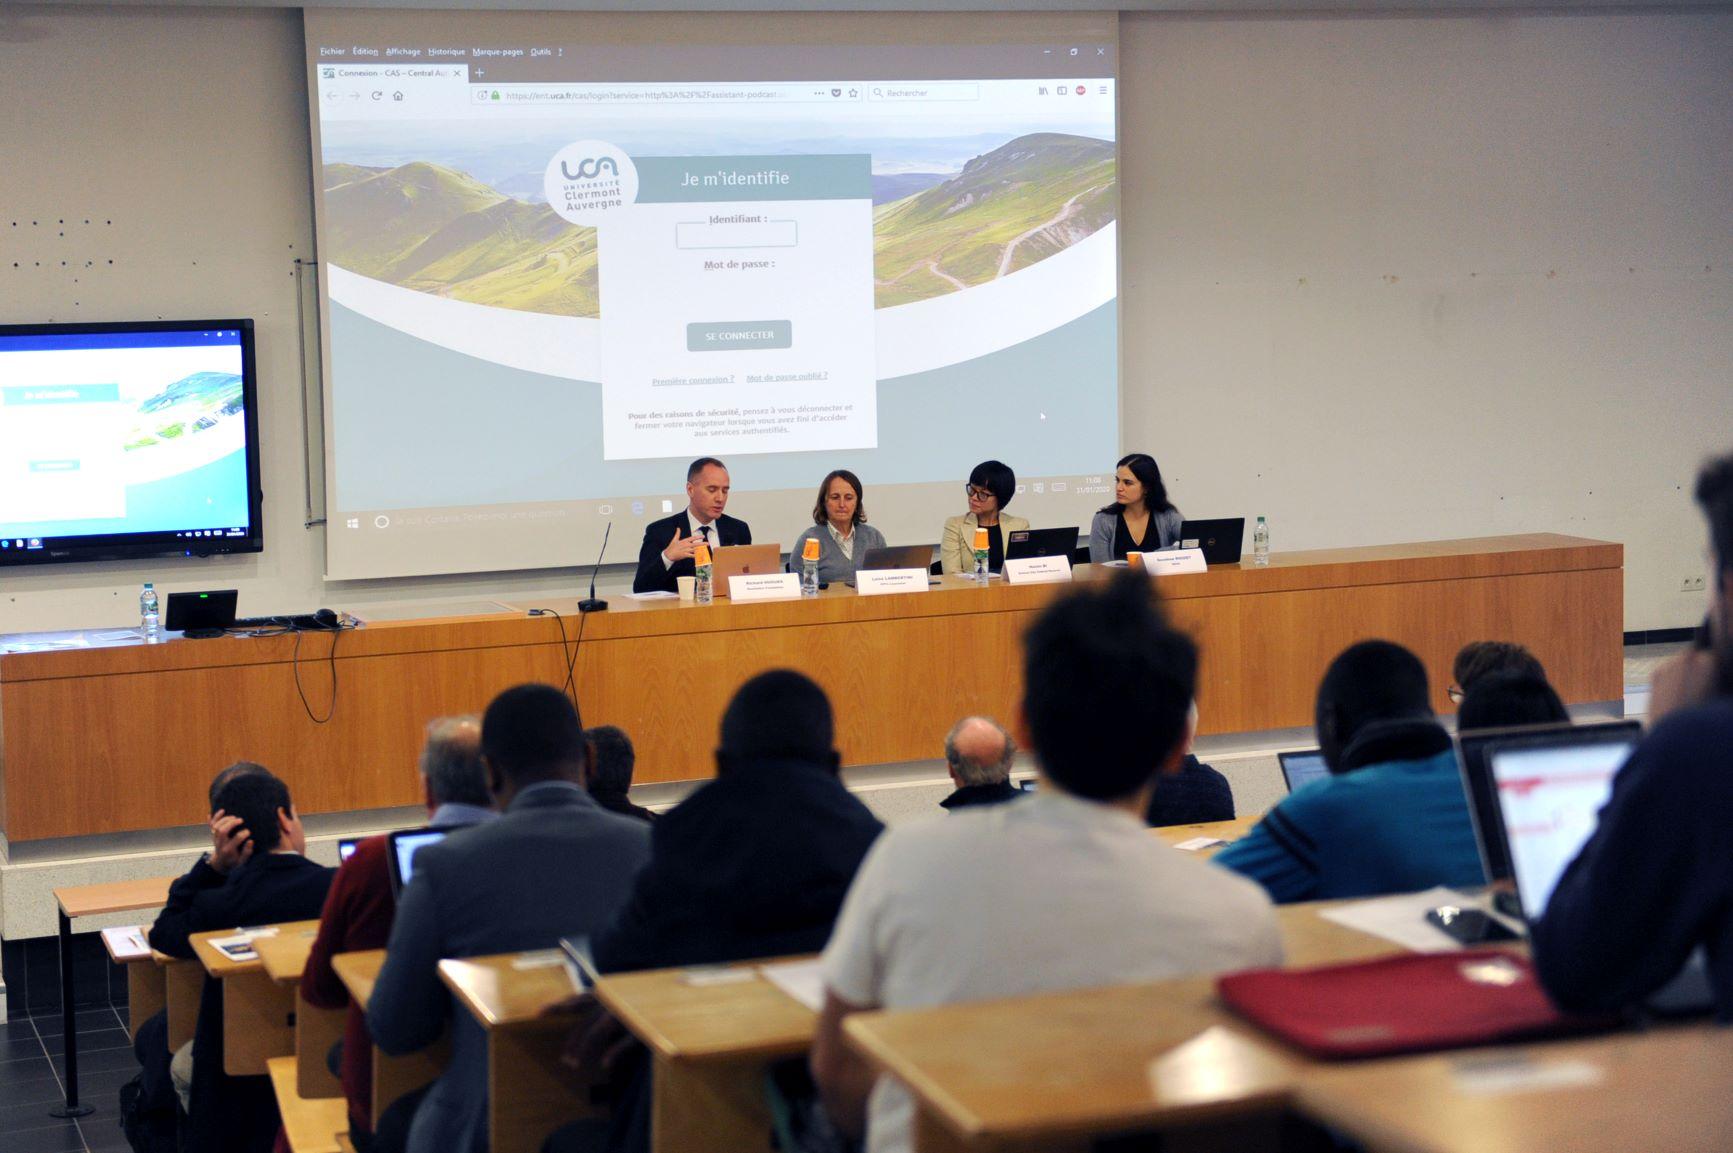 Policy Panel: Richard Hughes (Resolution Foundation, London), Luisa Lambertini (EPFL, Lausanne), Huixin Bi (Federal Reserve Bank of Kansas City), Dorothée Rouzet (OECD) © Aurélie Goumy